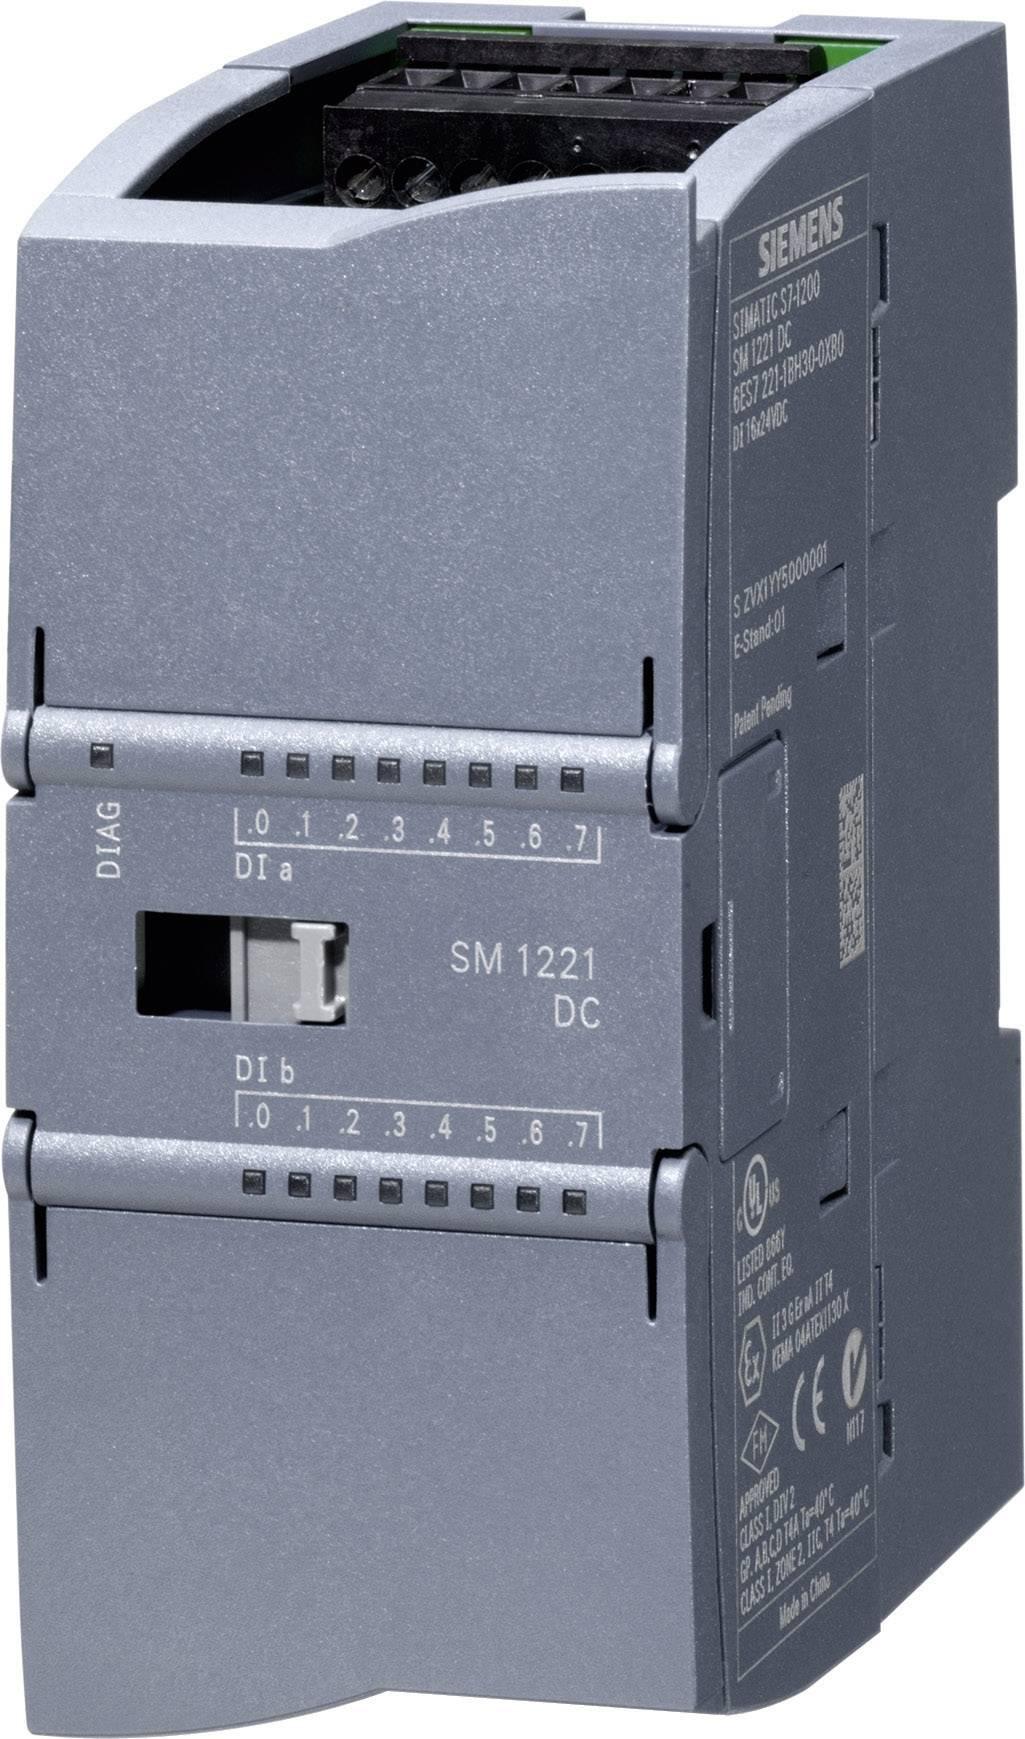 PLC rozširujúci modul Siemens SM 1221 6ES7221-1BF32-0XB0